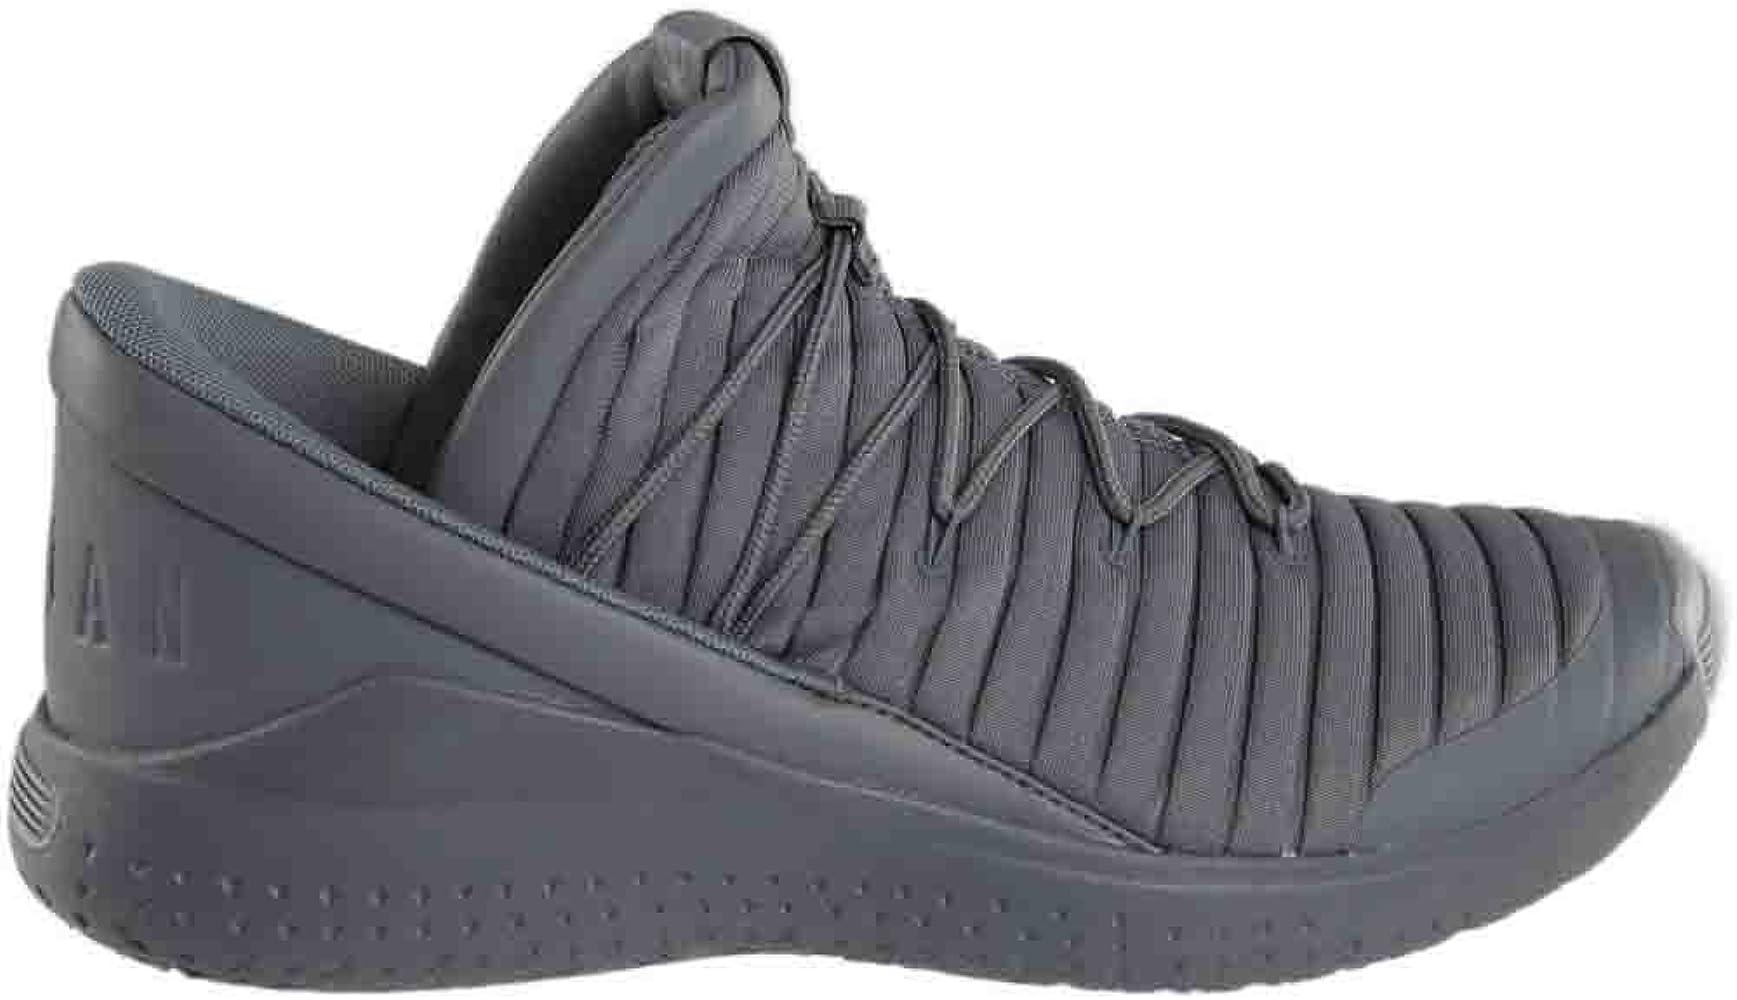 Amazon.com: Nike Air Jordan Flight Luxe baloncesto para ...